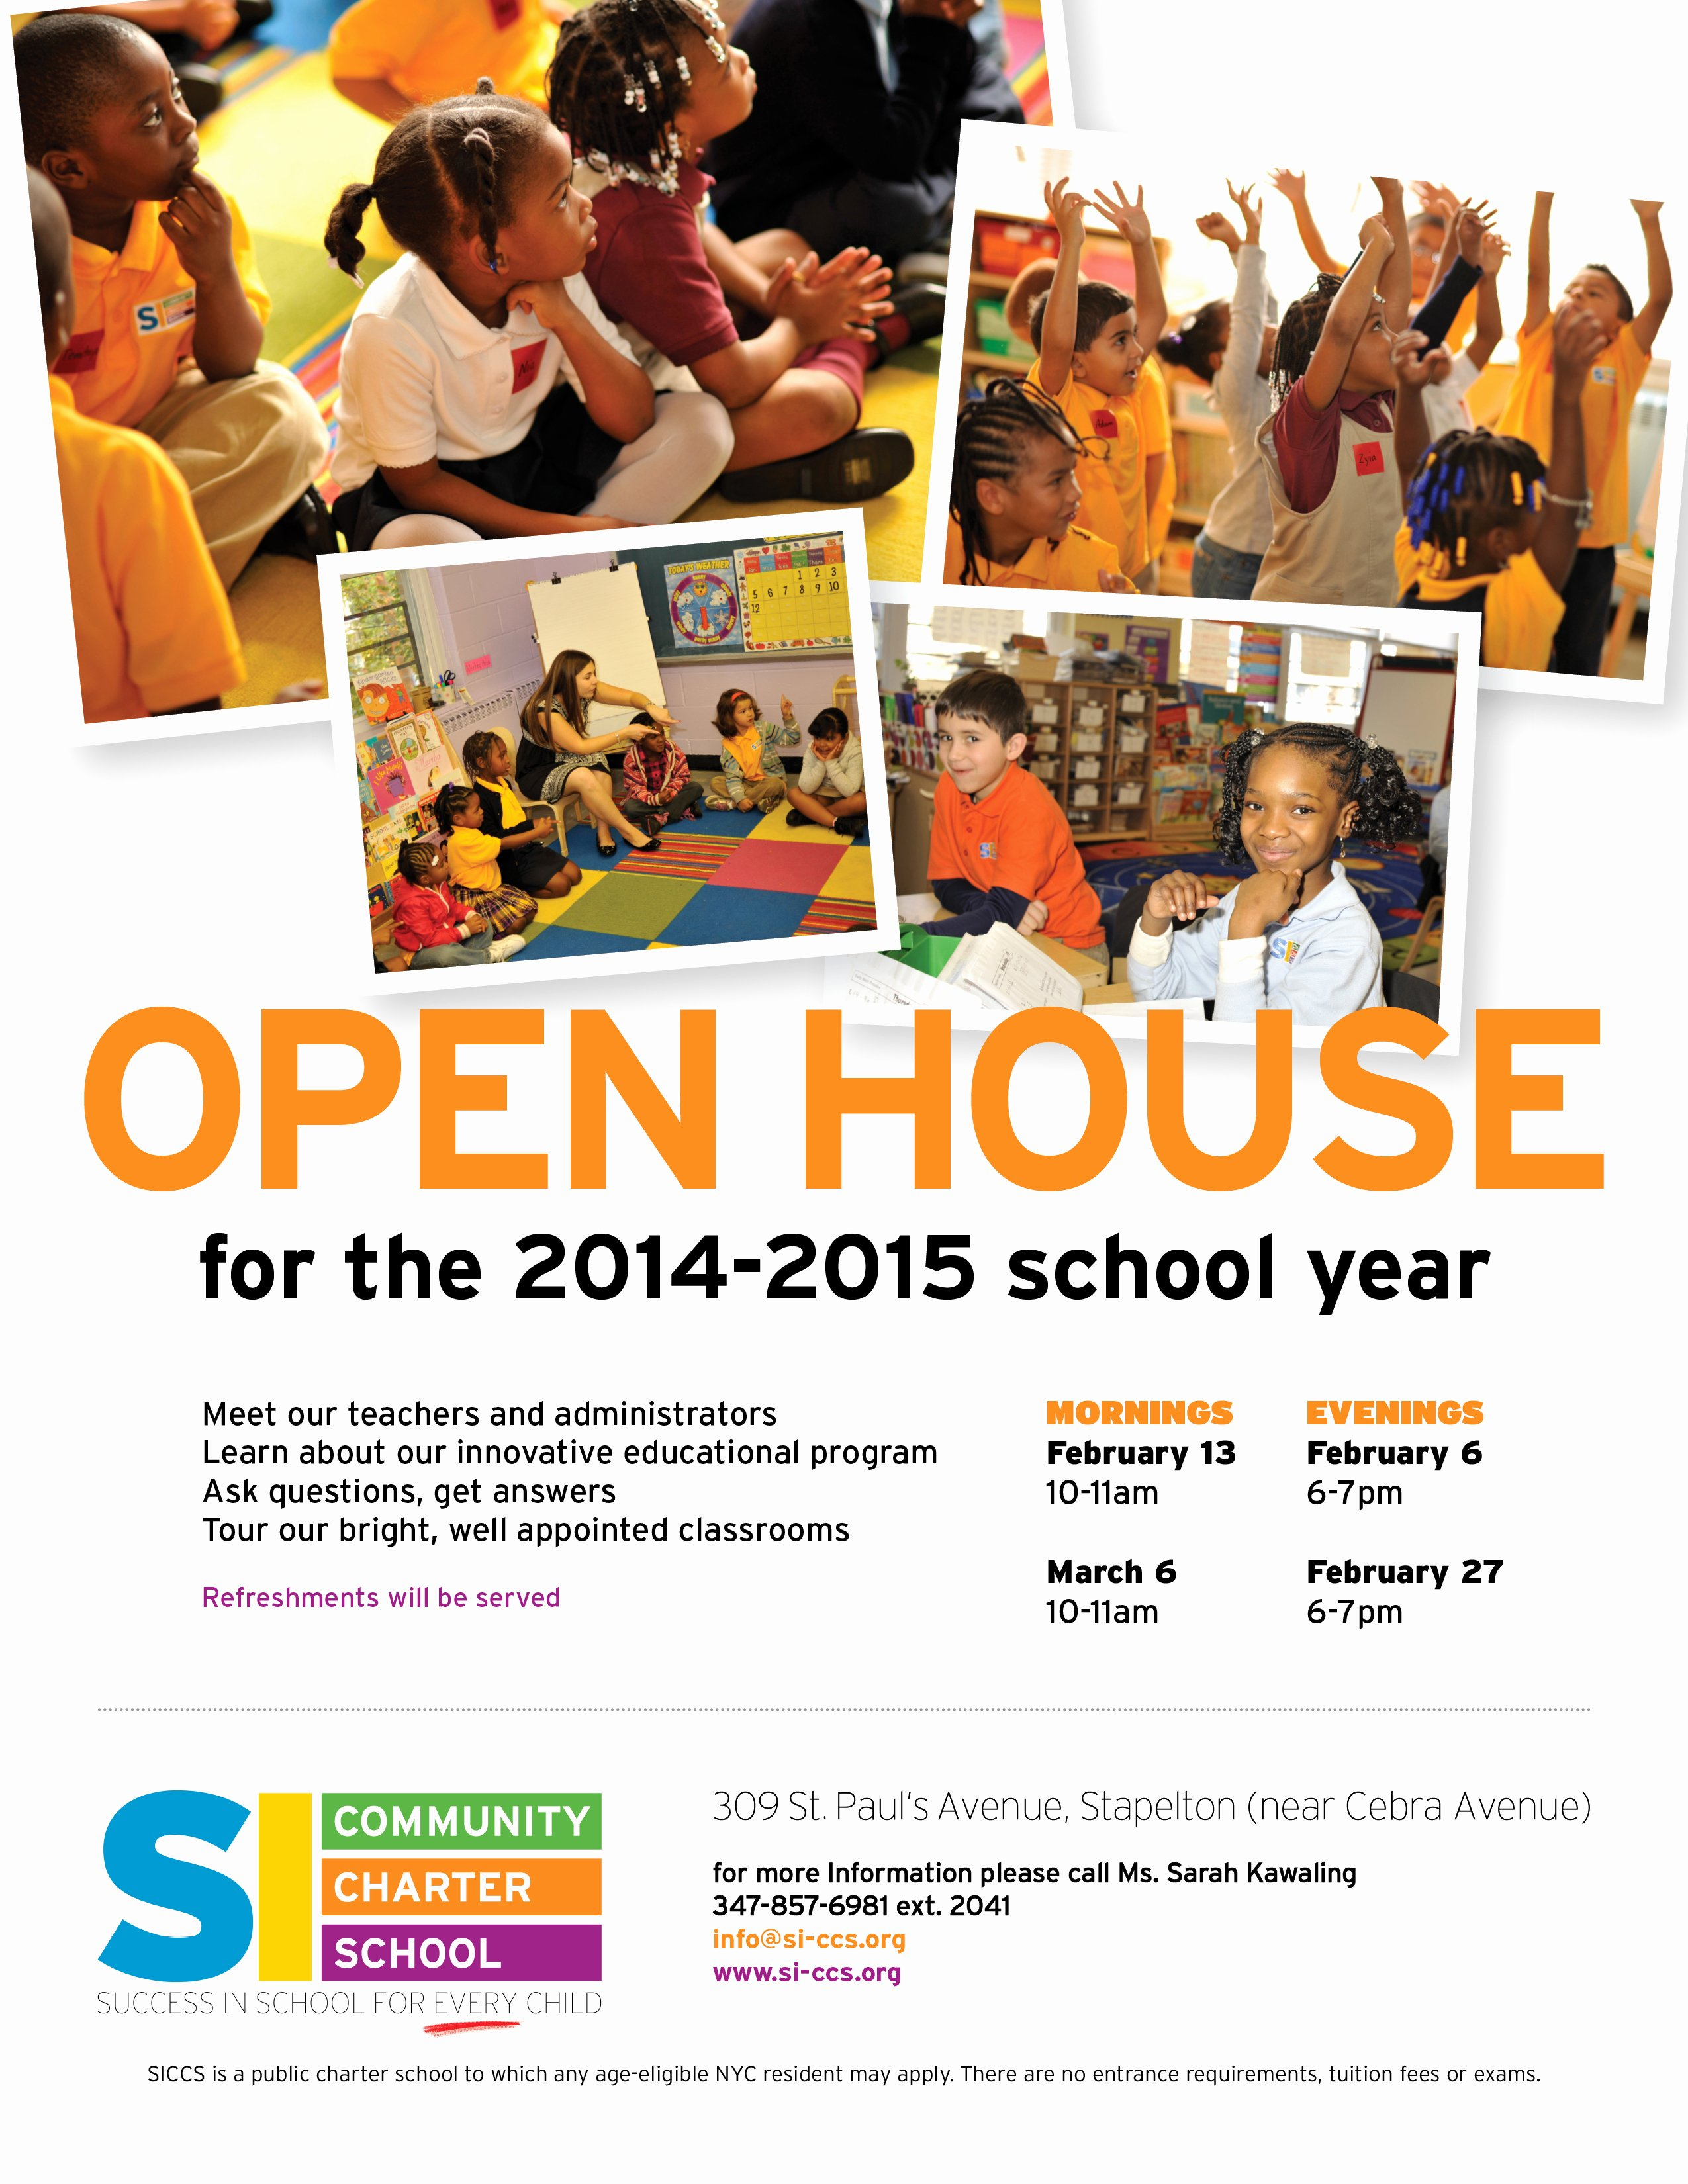 School Open House Flyer Template Portablegasgrillweber